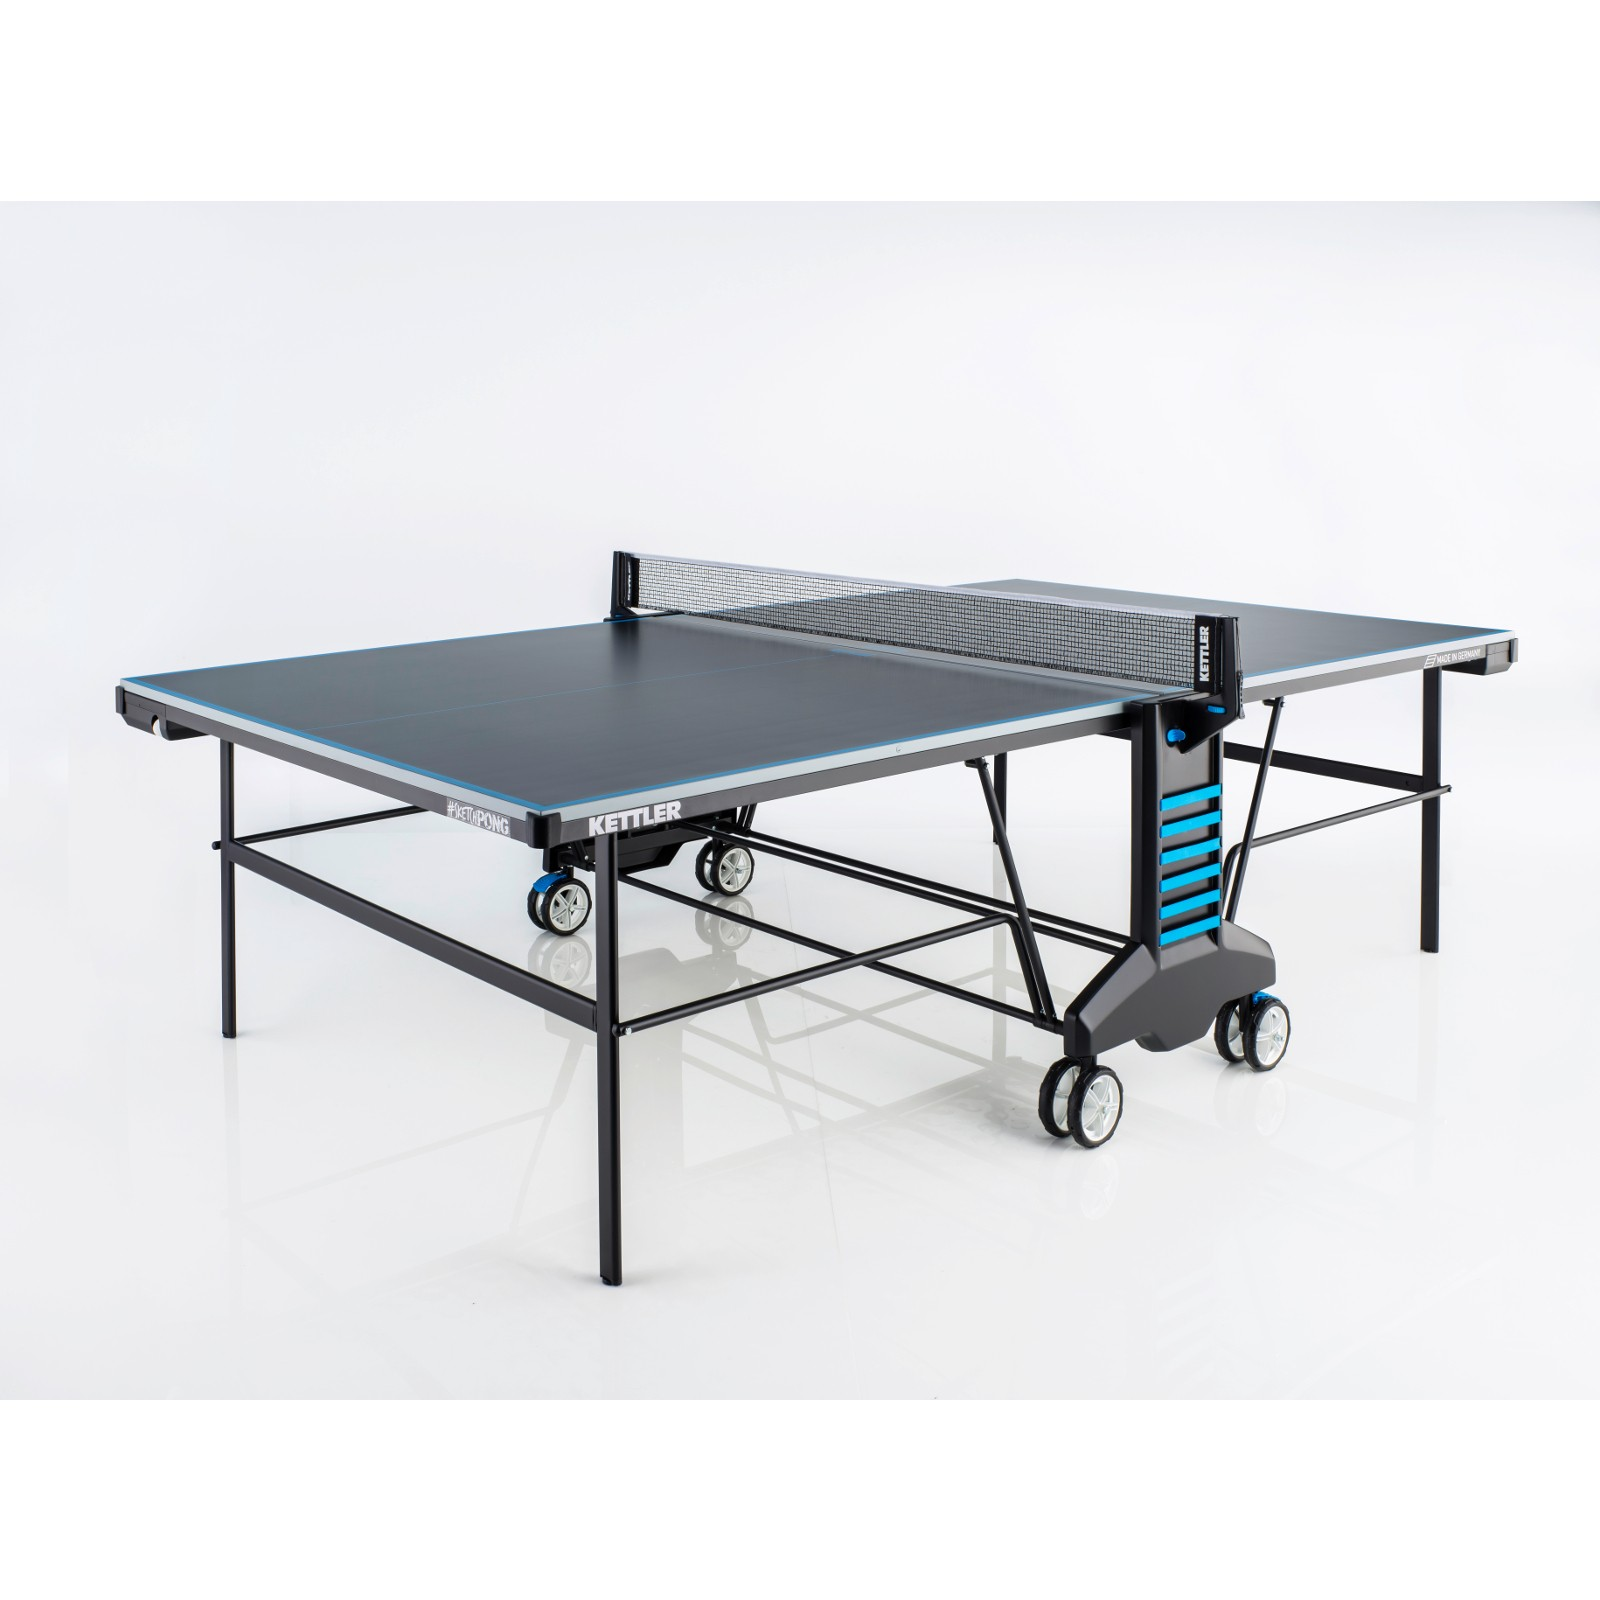 kettler table de ping pong sketch pong outdoor acheter. Black Bedroom Furniture Sets. Home Design Ideas